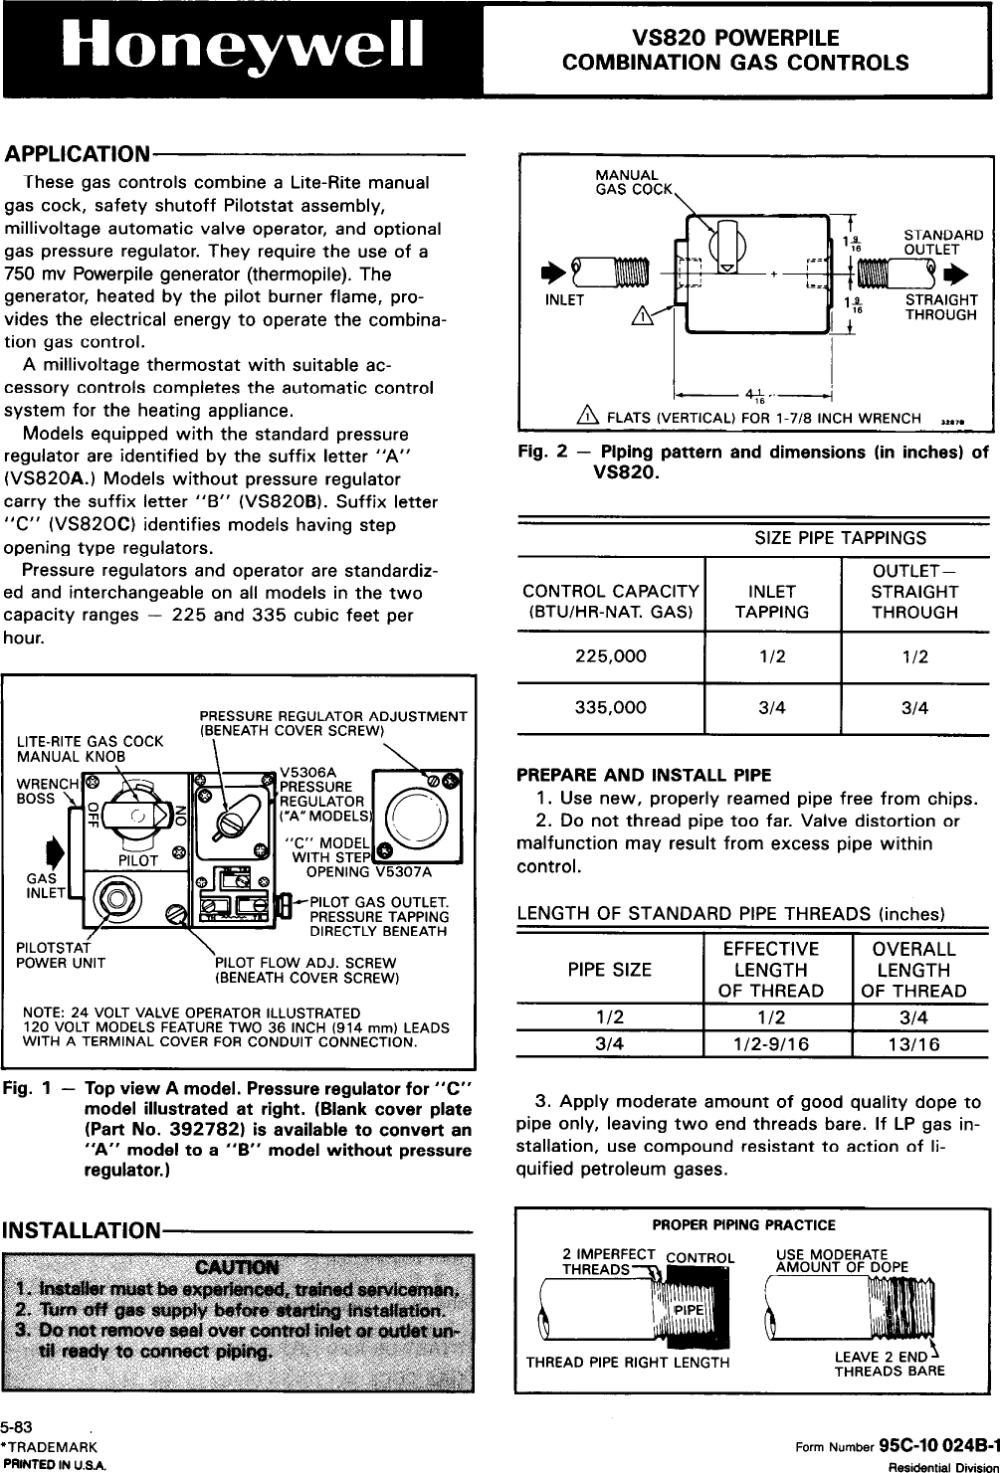 medium resolution of honeywell gas heater vs820 users manual 95c 10024b powerpile combination controls